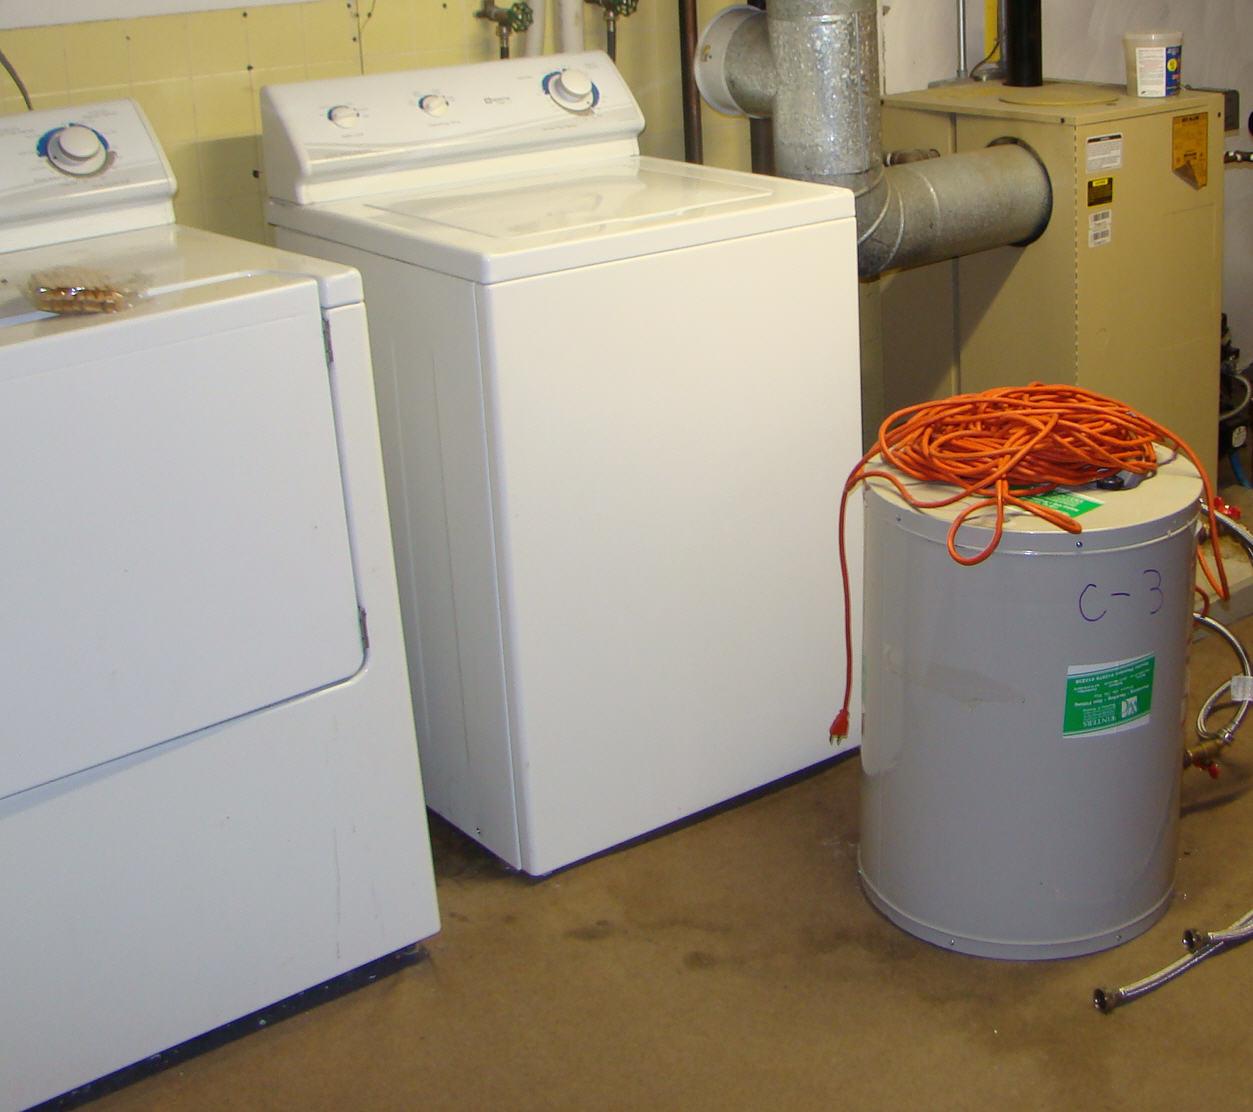 Miami Dryer Repair service for Whirlpool, Kenmore, GE